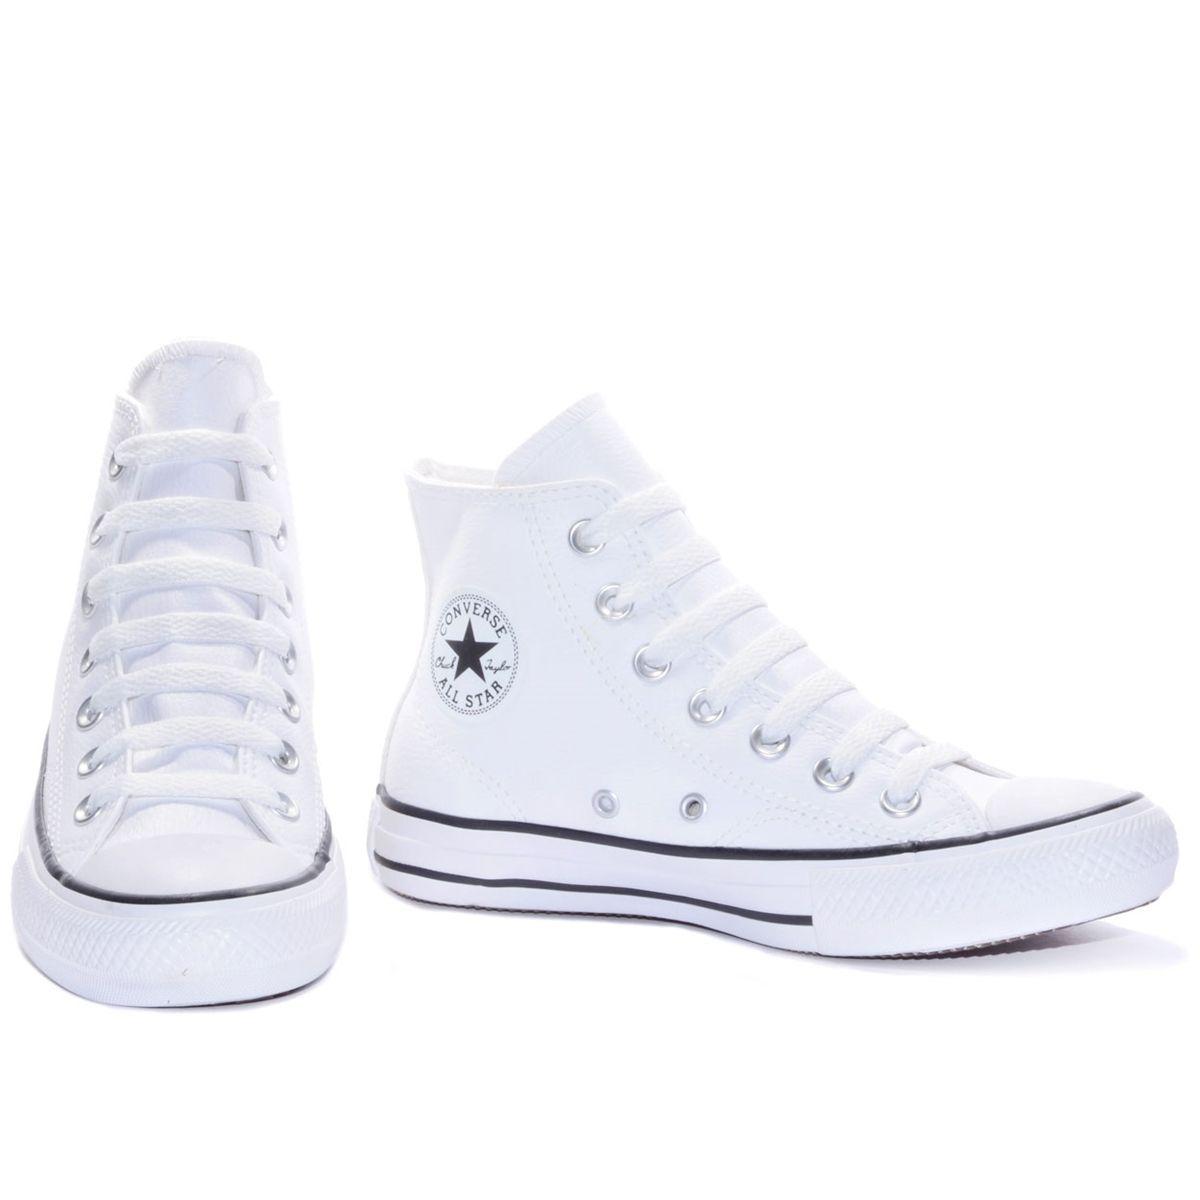 0fba31116 All Star cano médio branco